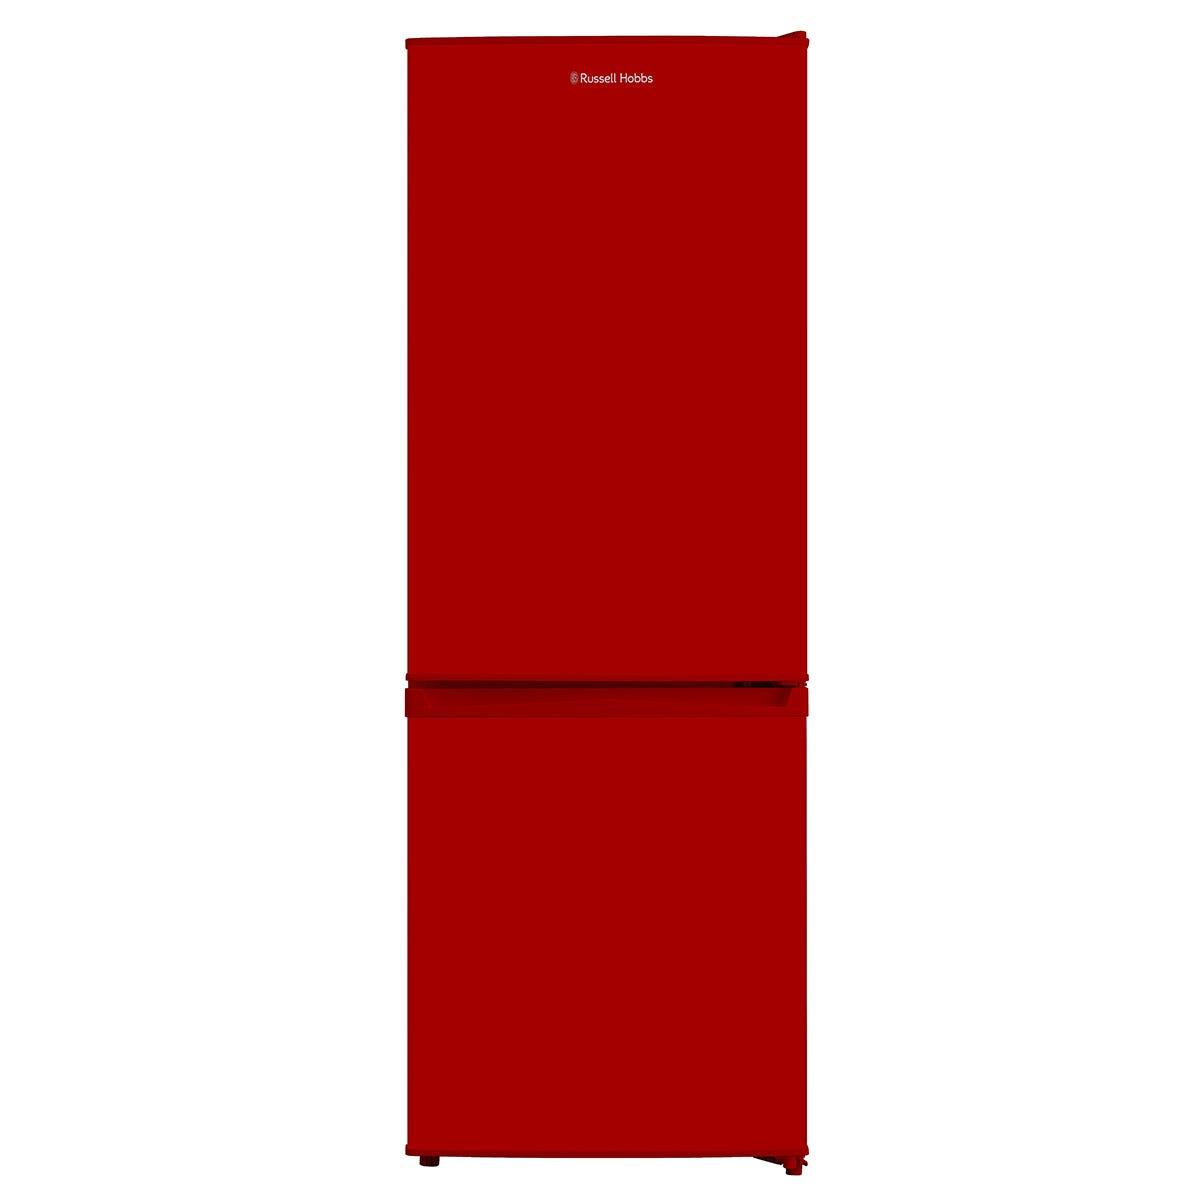 Russell Hobbs RH50FF144R 167L Freestanding Fridge Freezer - Red